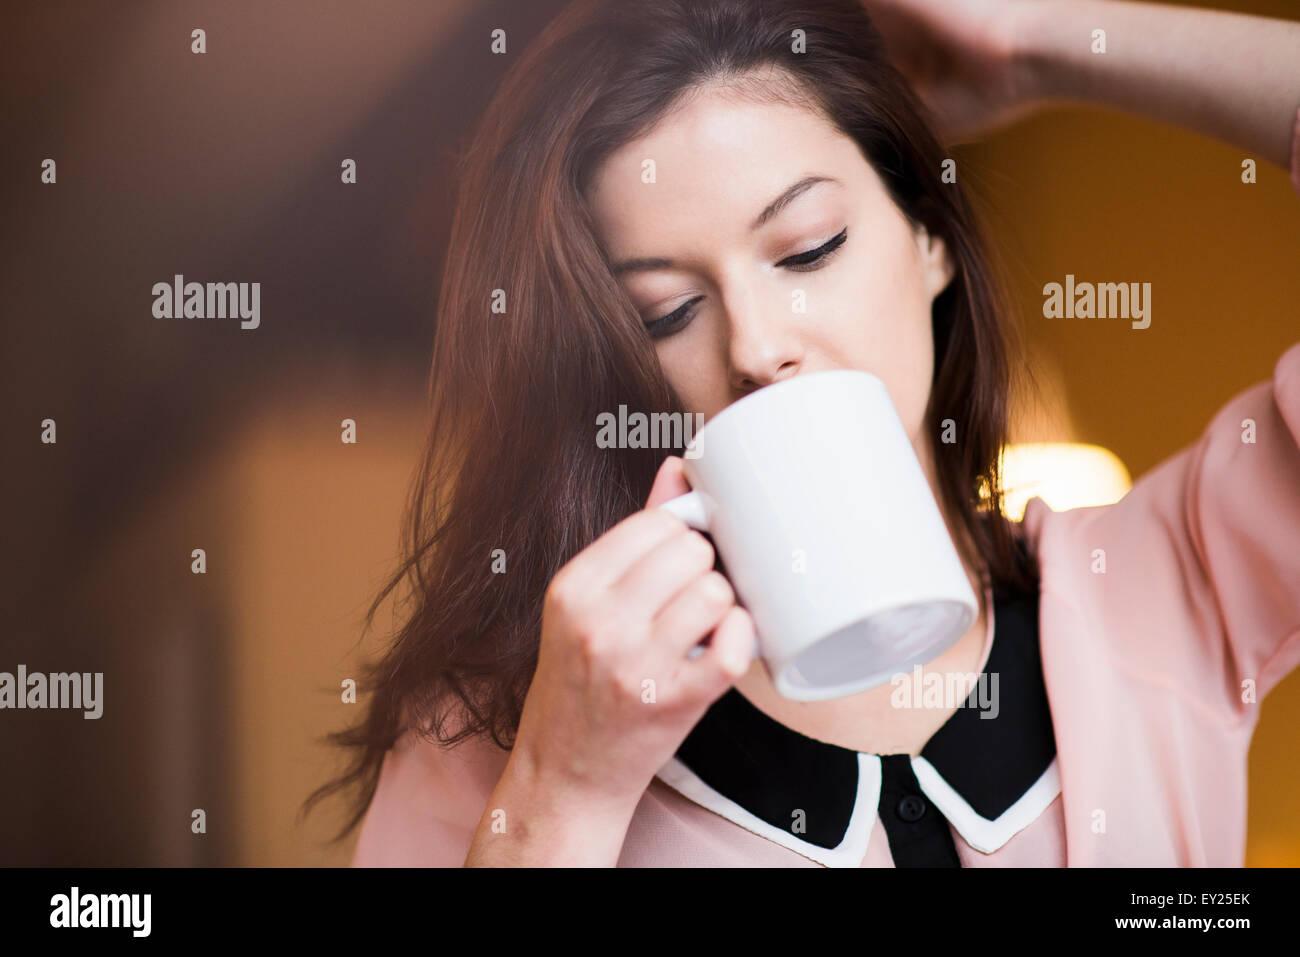 Junge Frau Kaffee trinken Stockfoto